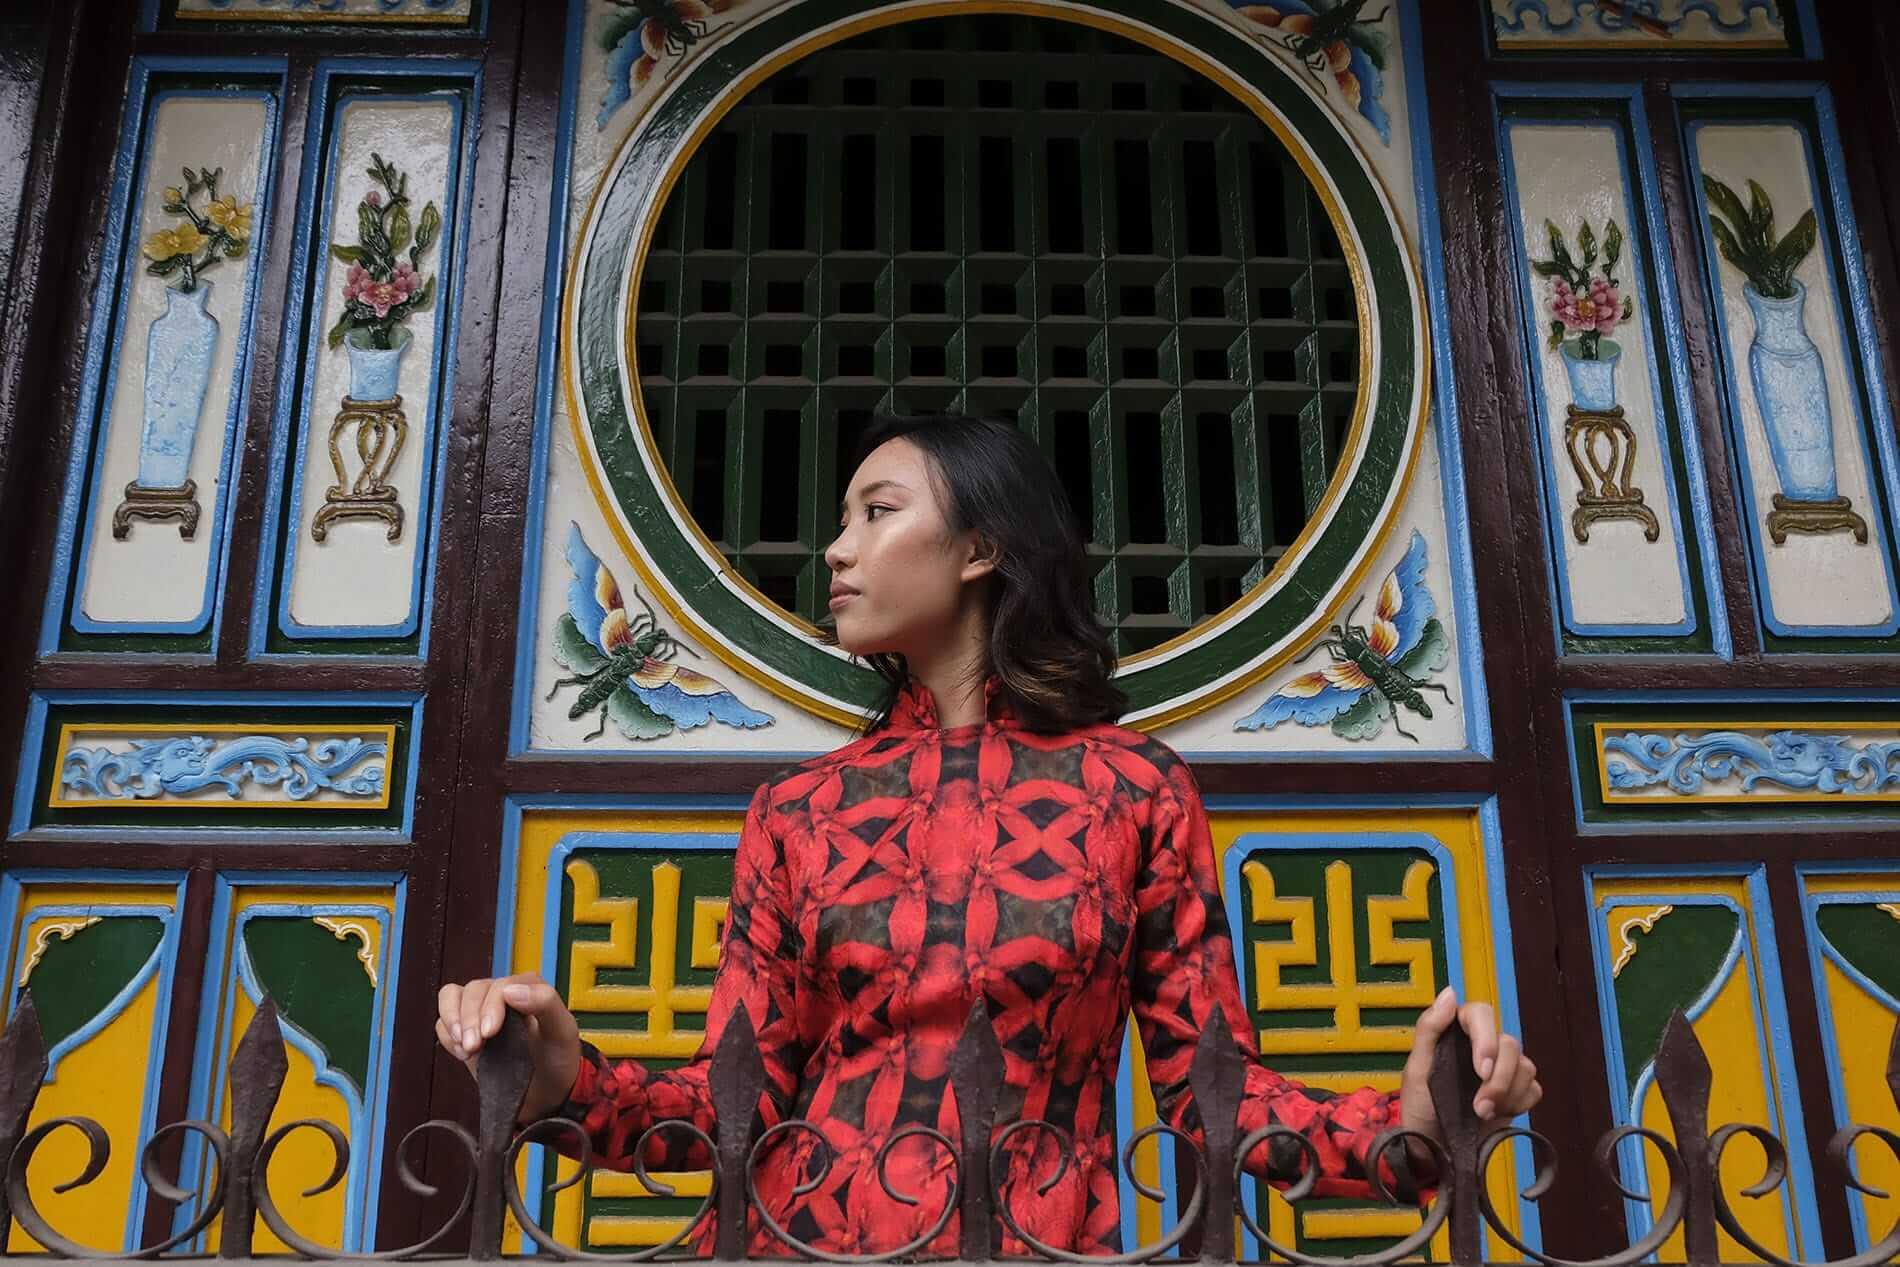 Chula fashion shoot in Hoi An